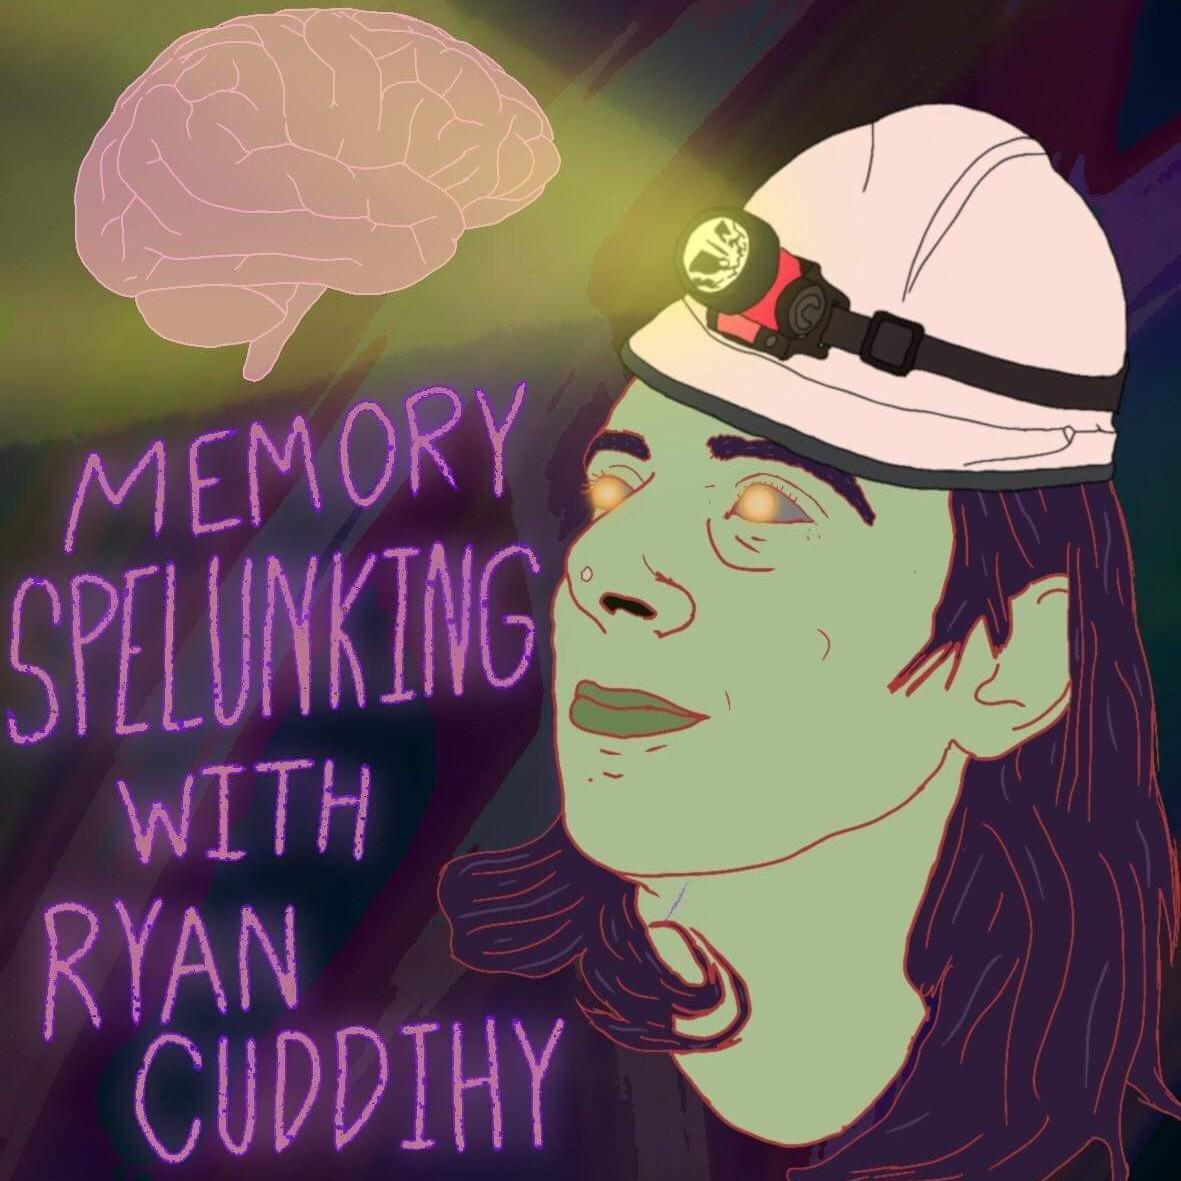 """We Got You a Turkey!"" Memory Spelunking with Ryan Cuddihy"